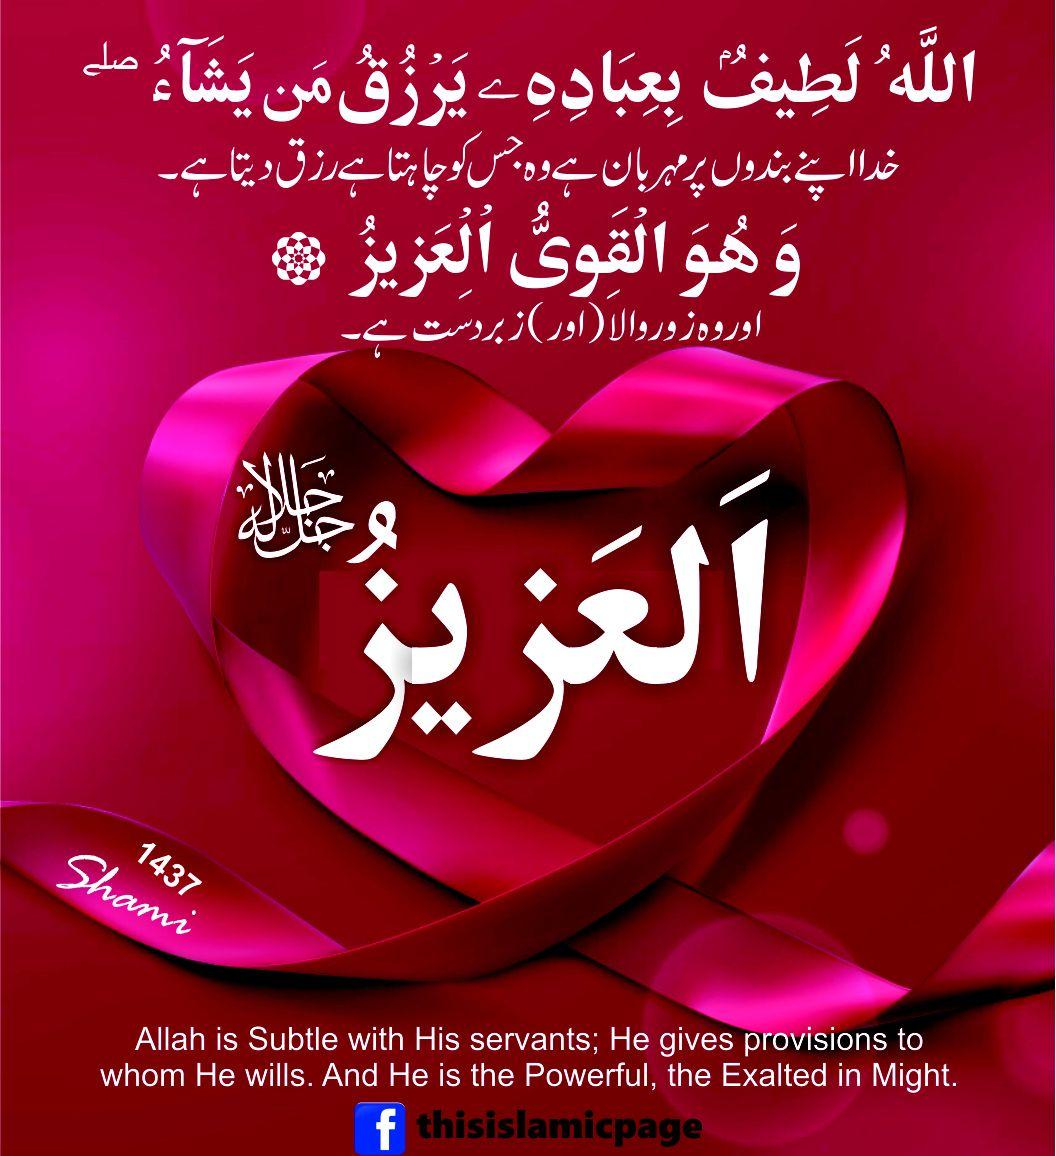 الل ه ل ط يف ب ع ب اد ه ي ر ز ق م ن ي ش اء و ه و ال ق و ي ال ع ز يز الشورى 19 Allah Is Subtle With His Serva Allah Names Allah Islamic Quotes